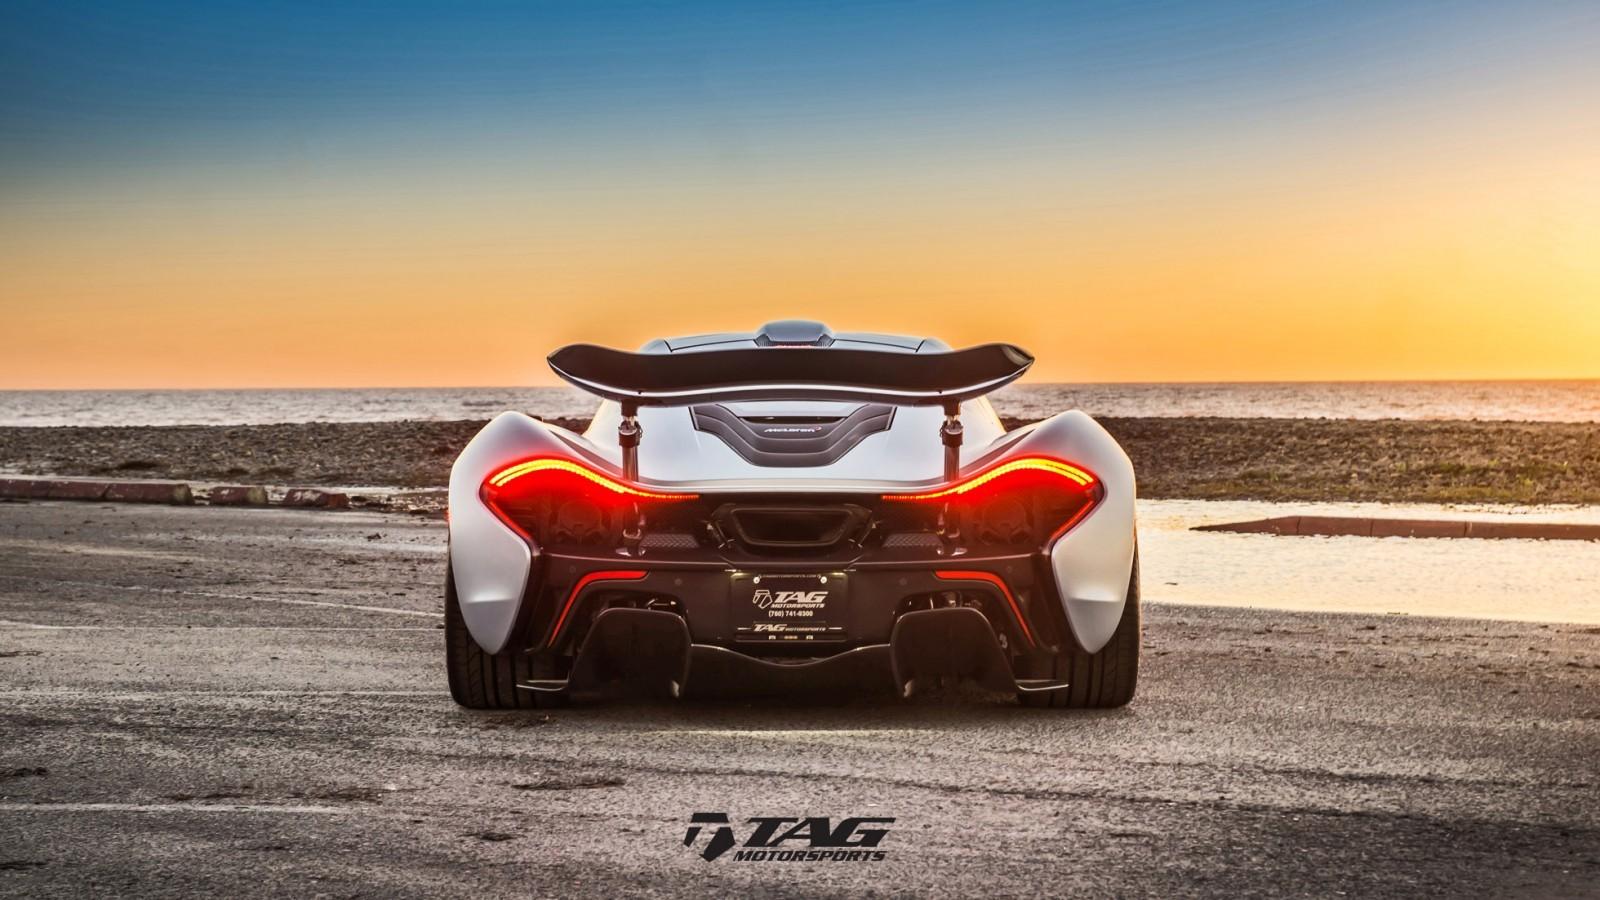 http://www.car-revs-daily.com/wp-content/uploads/2015/12/TAG-Motorsports-2015-McLaren-P1-HRE-P101-Alloys-2-1600x900.jpg